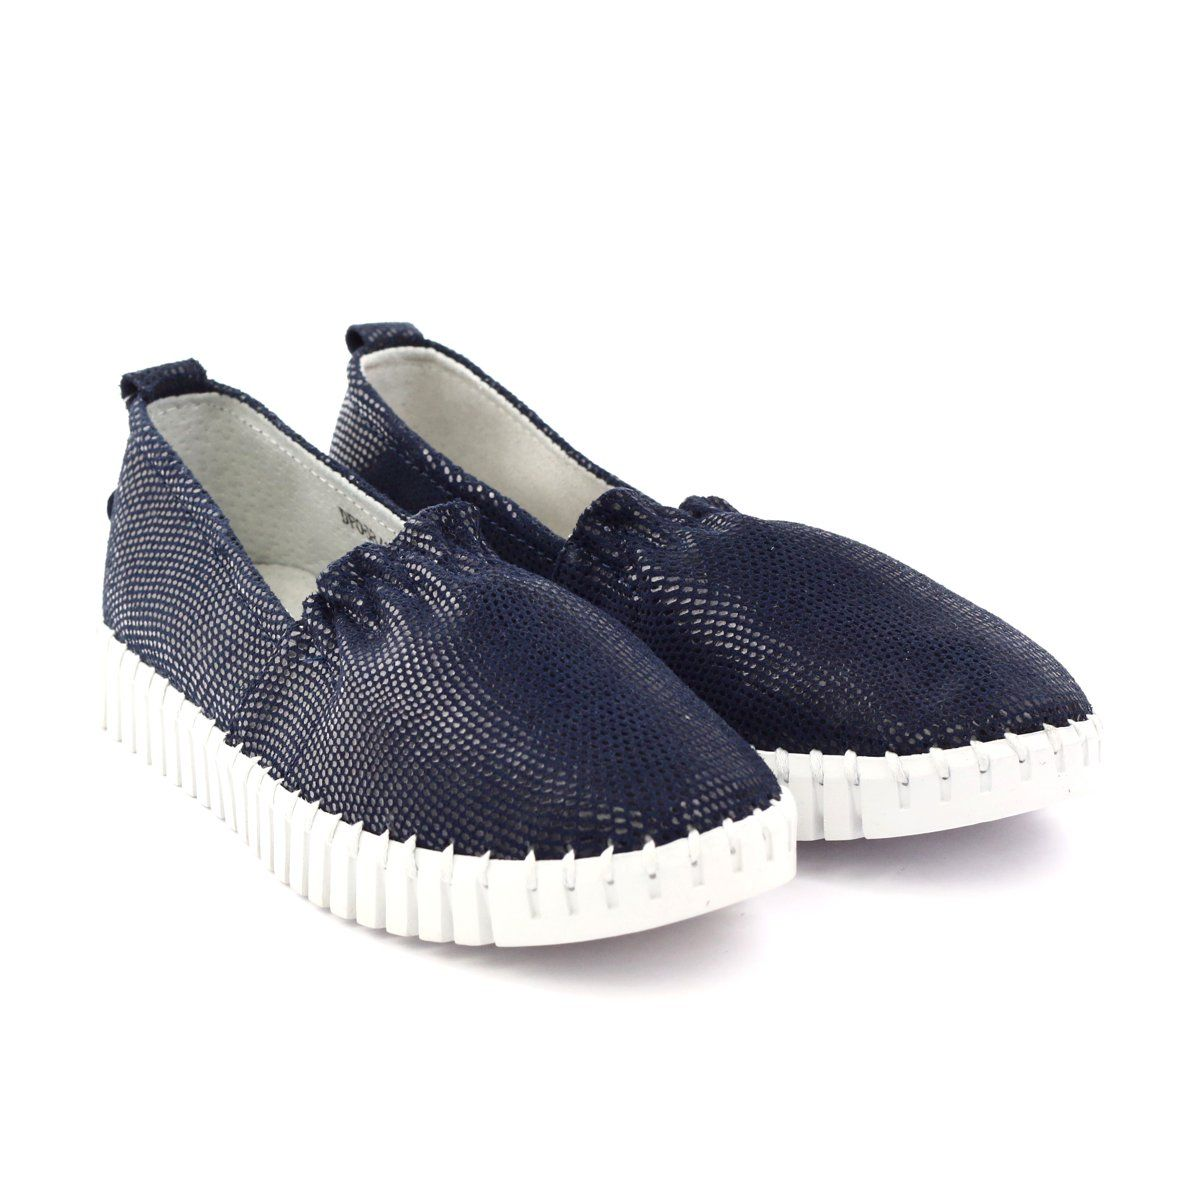 Women S Shoes Filippo Navy Blue Husk Women Shoes Shoes Shoe Inserts